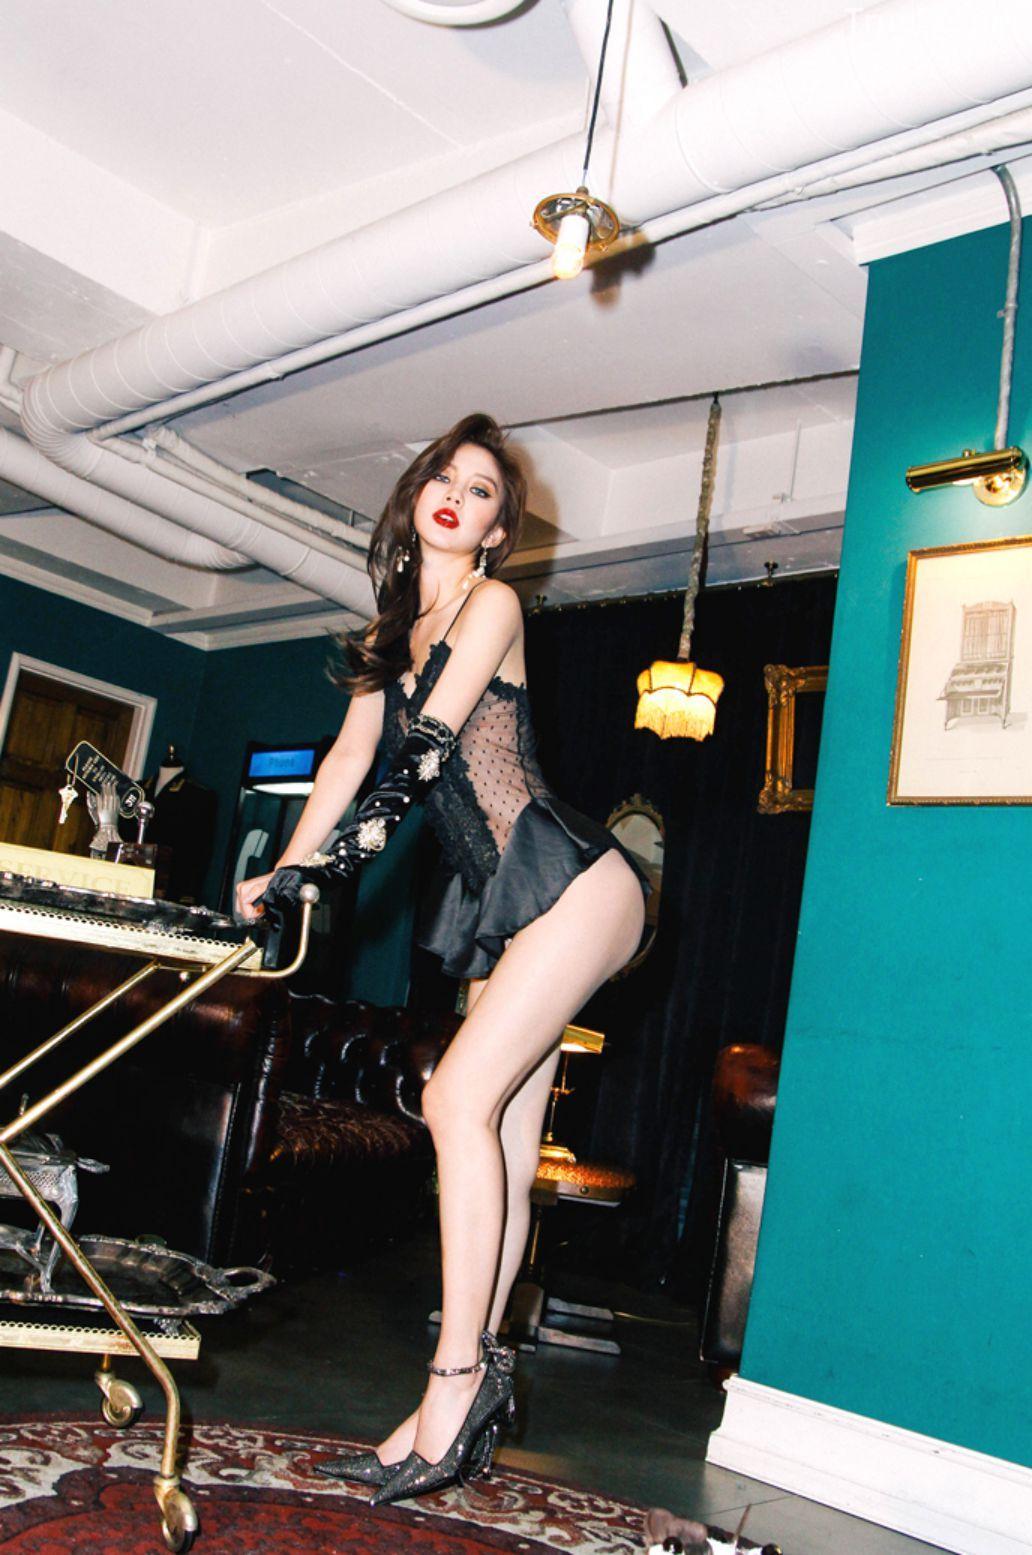 Lee Chae Eun - Korean Lingerie Model - Love Me More Sexy - TruePic.net - Picture 7